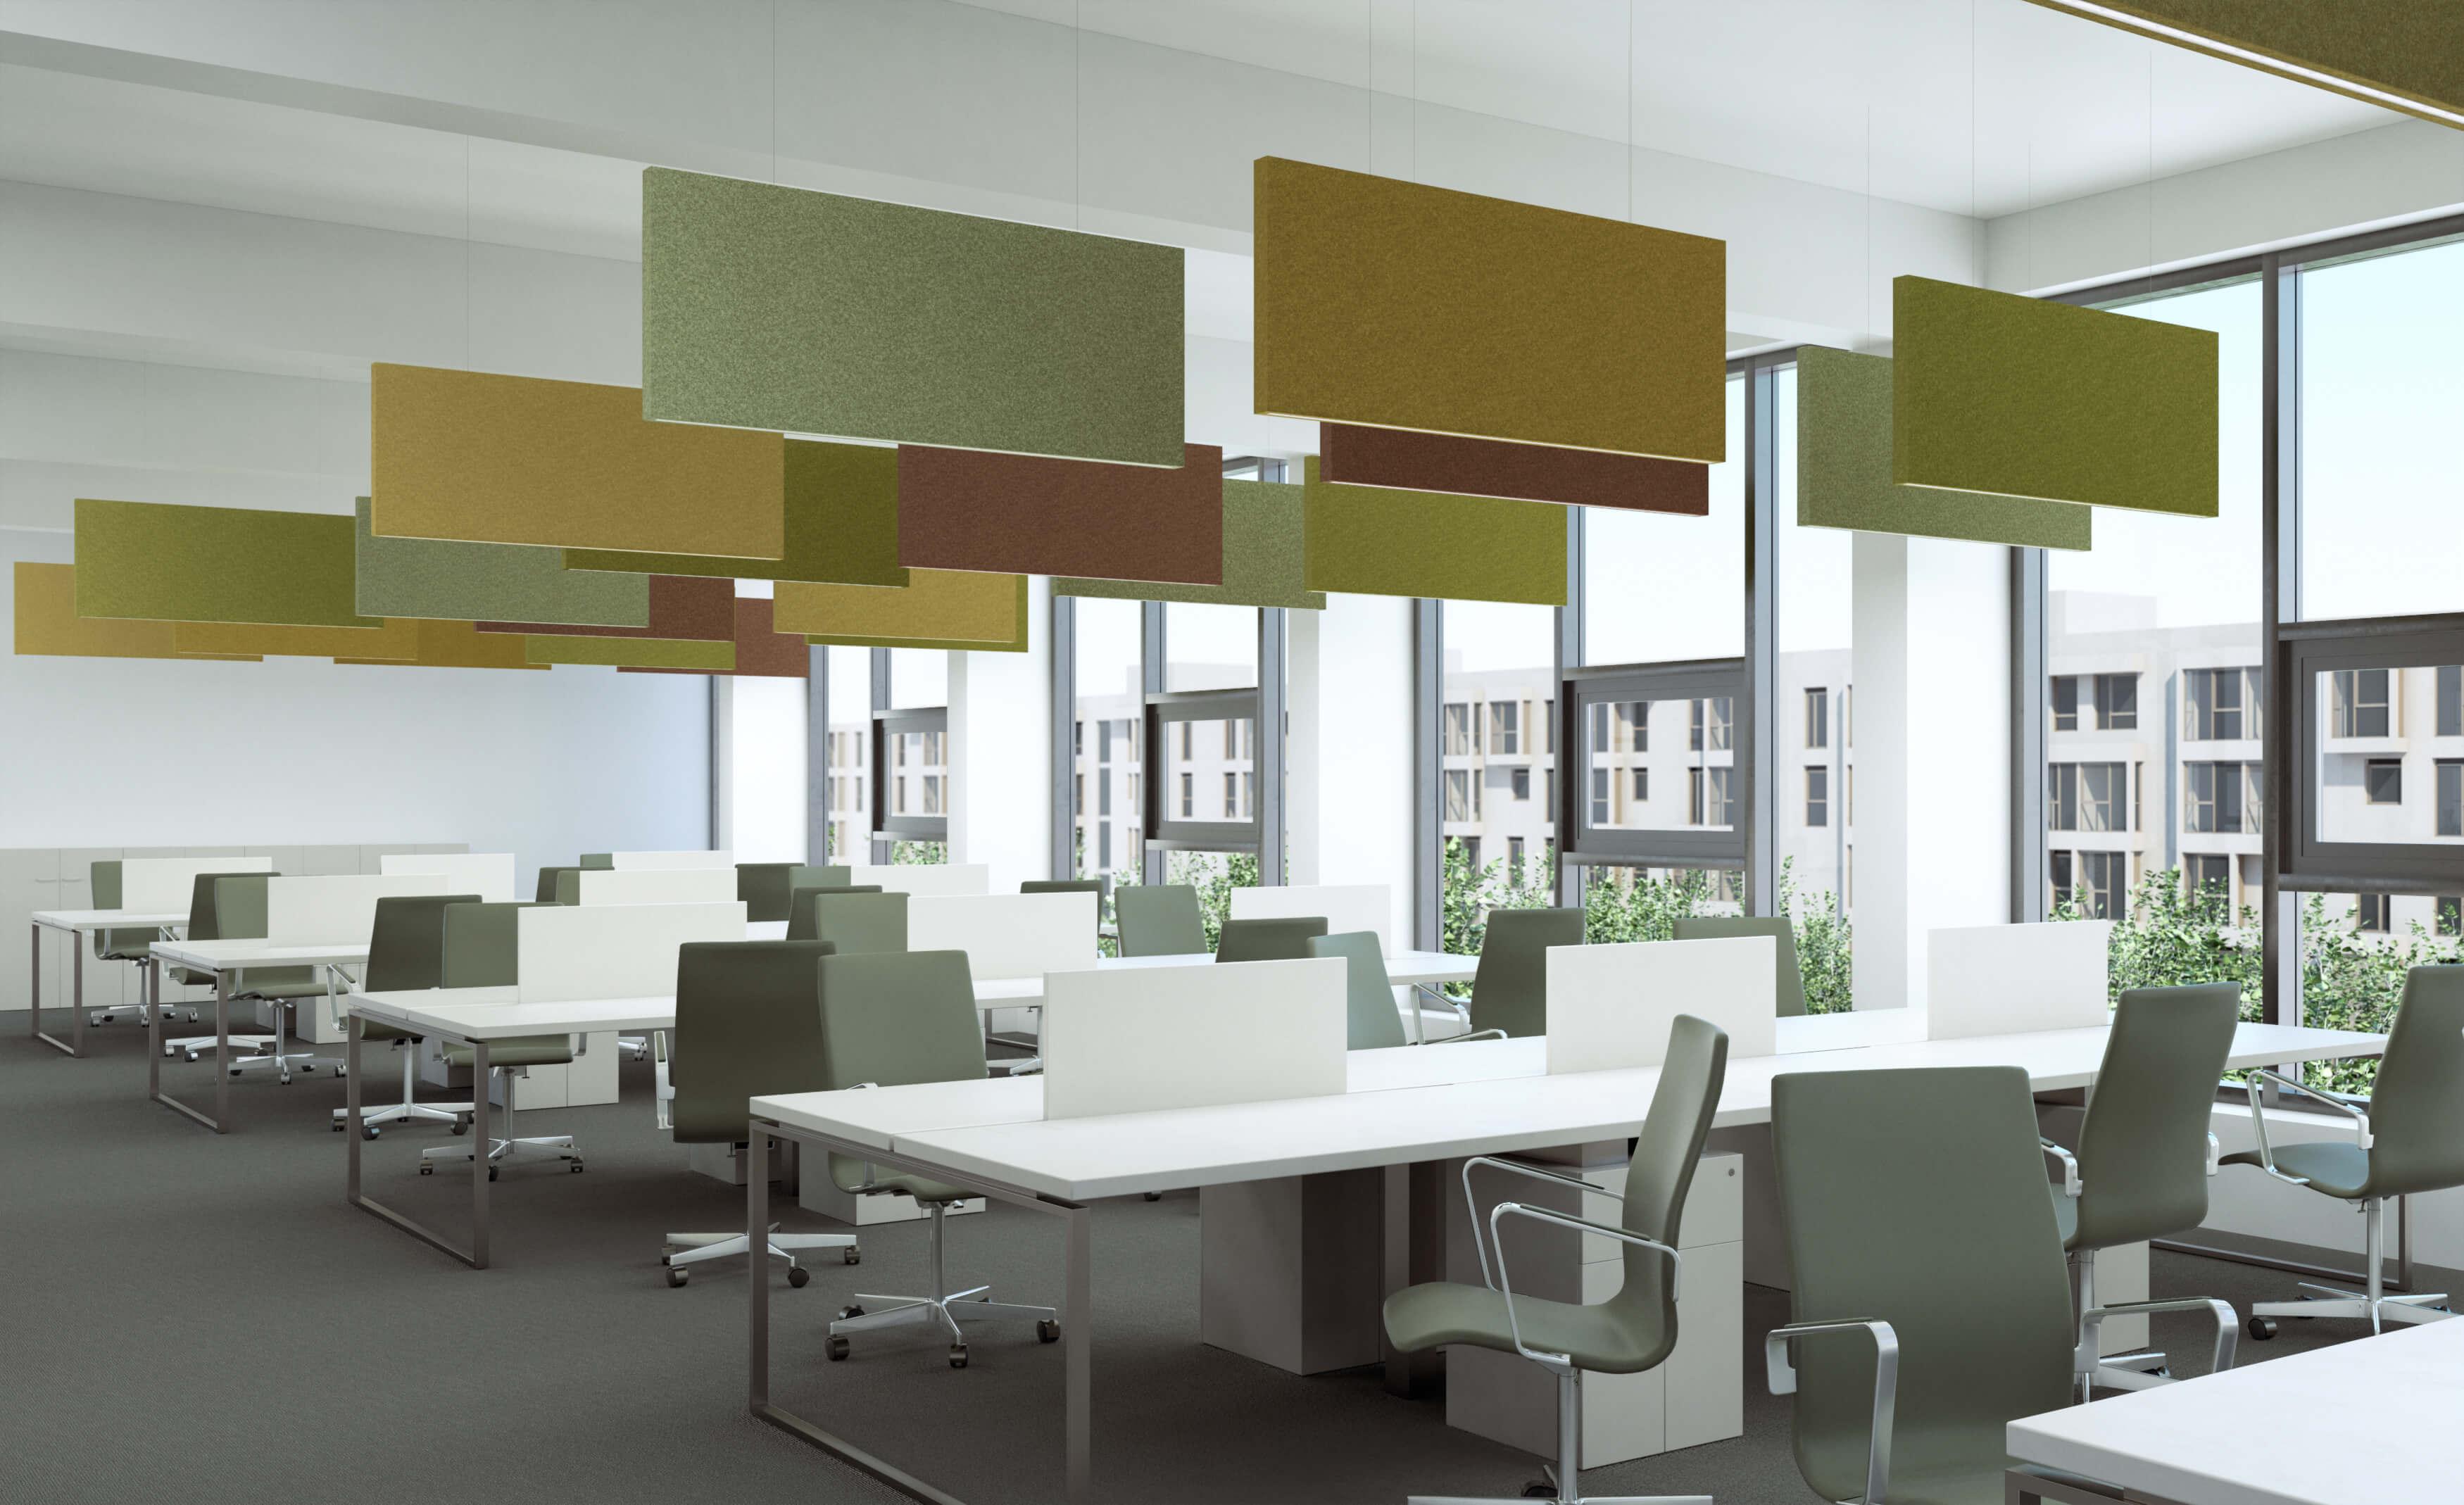 Oficina con iluminación y paneles absorbentes acústicos